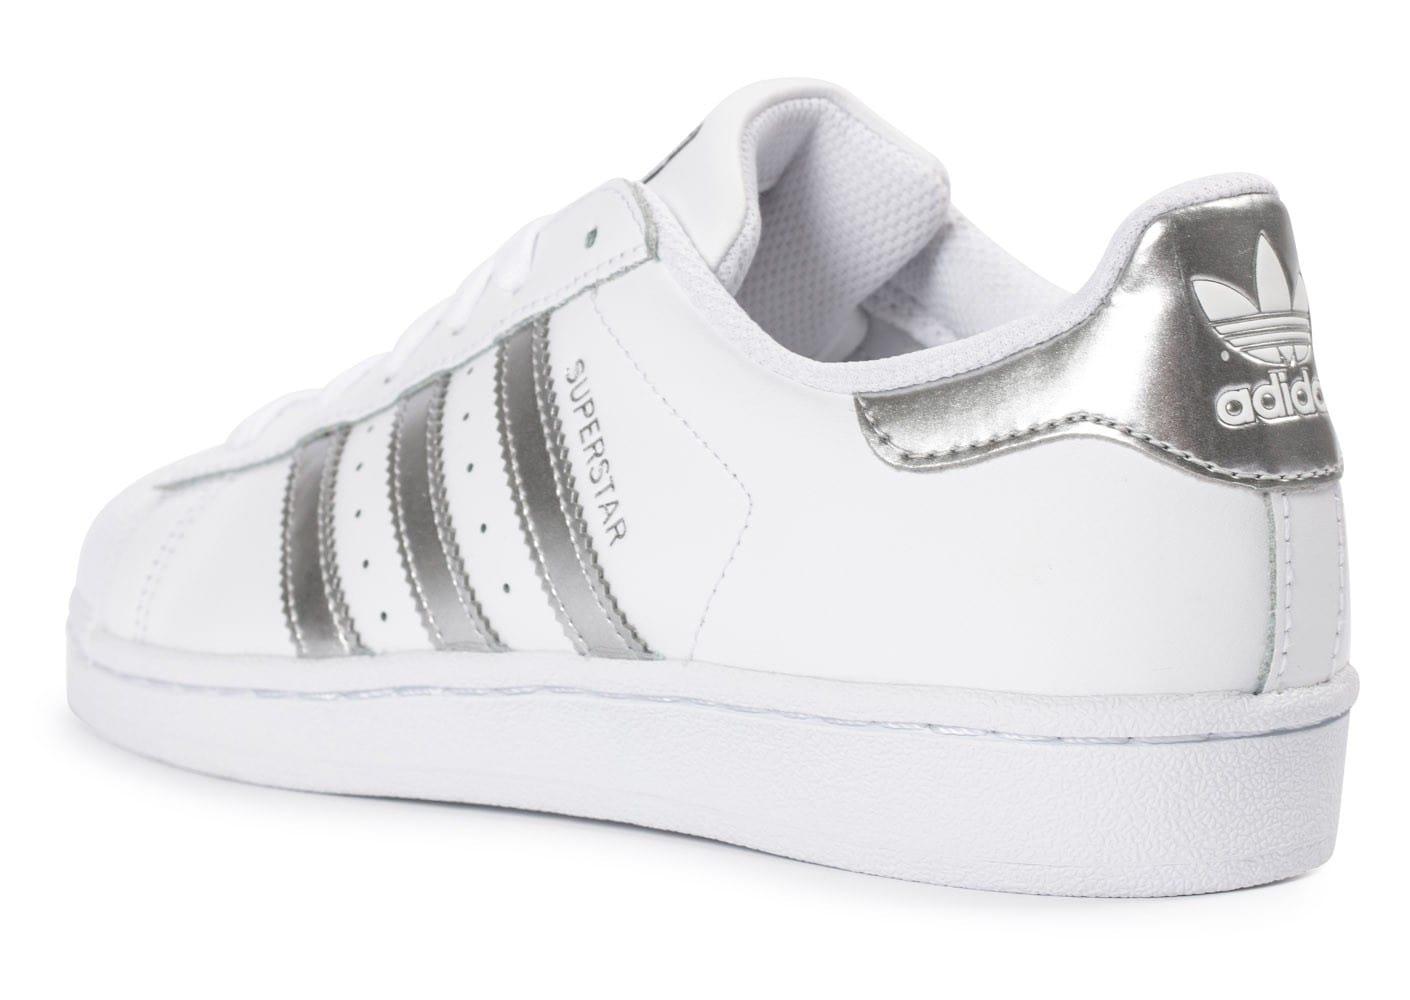 revendeur 2a760 11302 adidas superstar blanc argente - www.tasapisitargemaks.eu